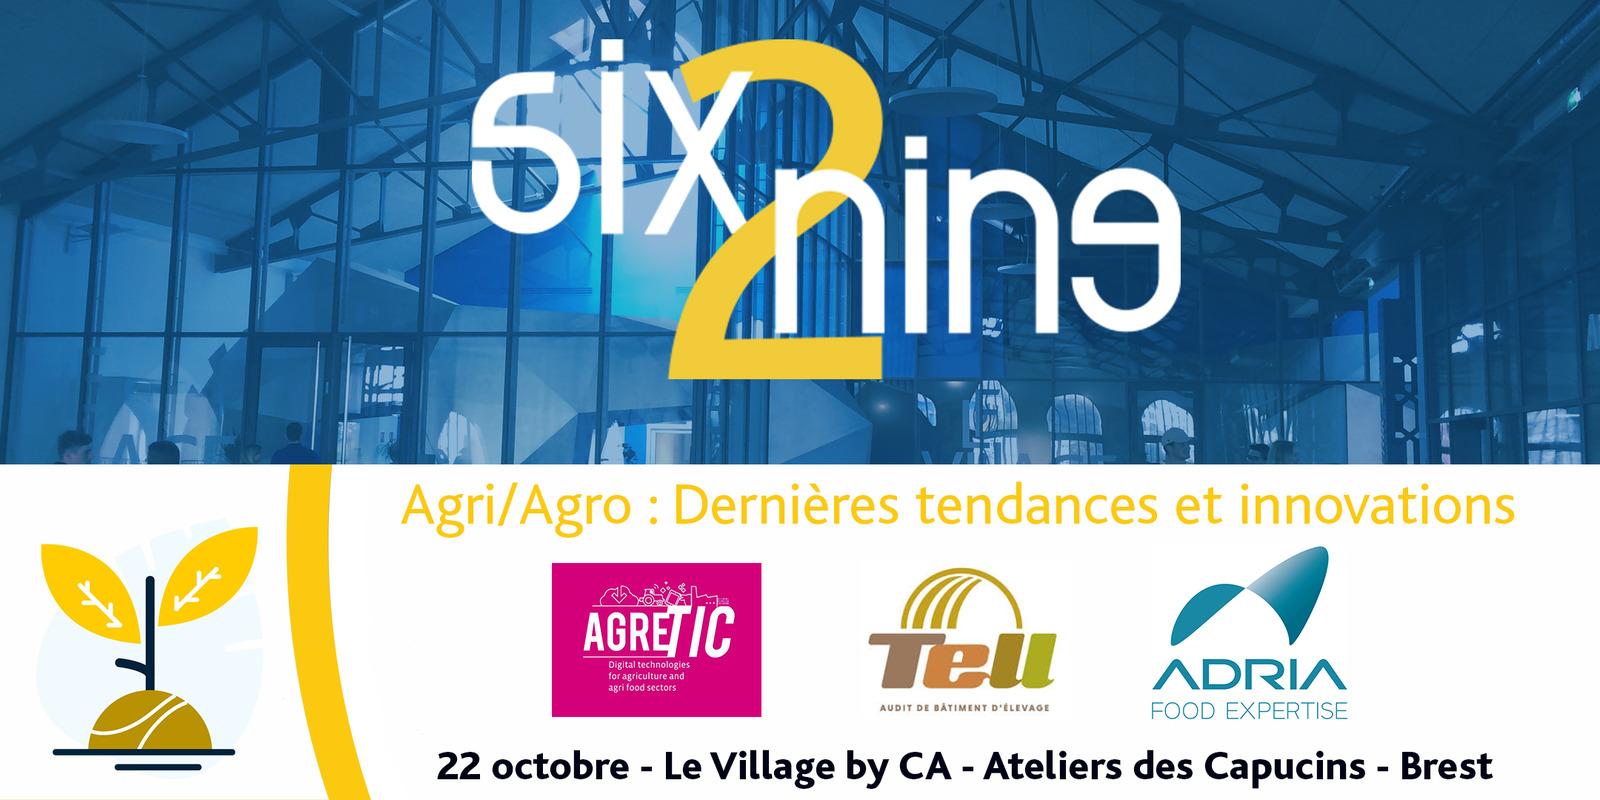 Six2Nine du 23 octobre - Agri/Agro : Dernières tendances et innovations